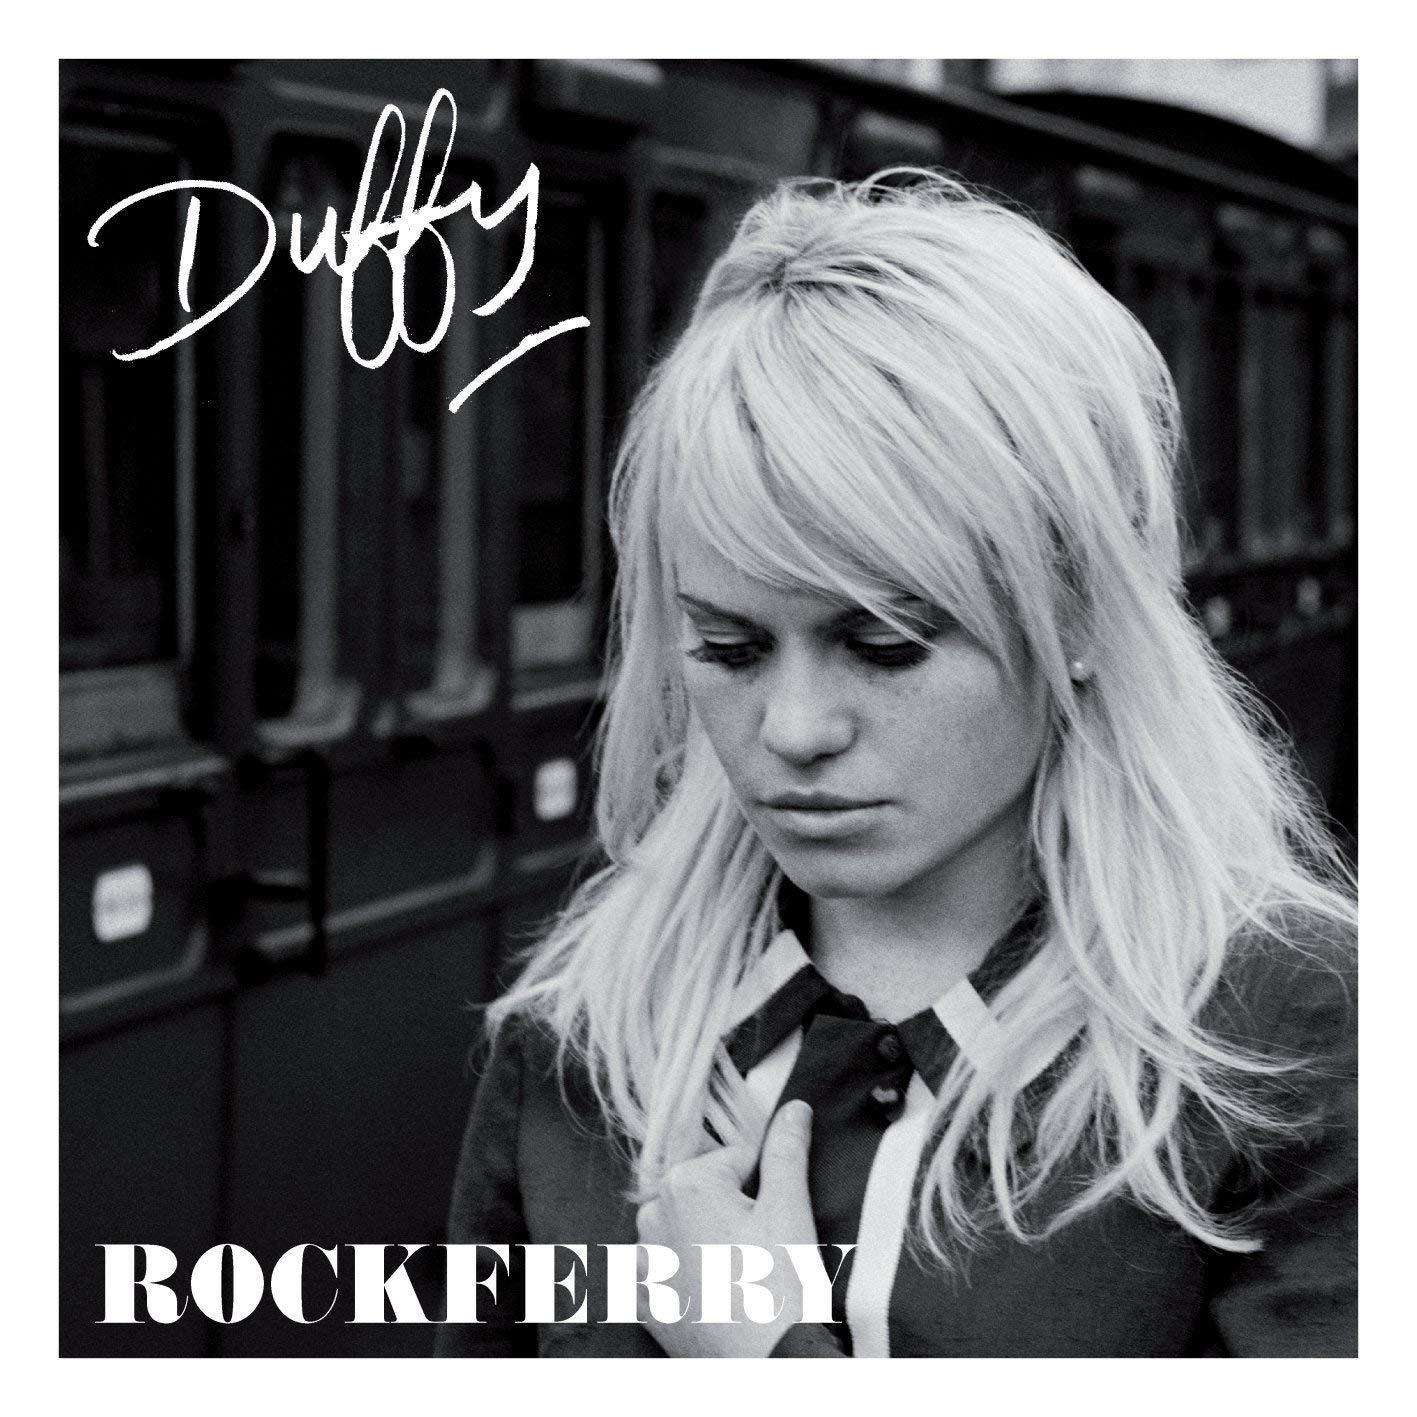 duffy rockferry album cover